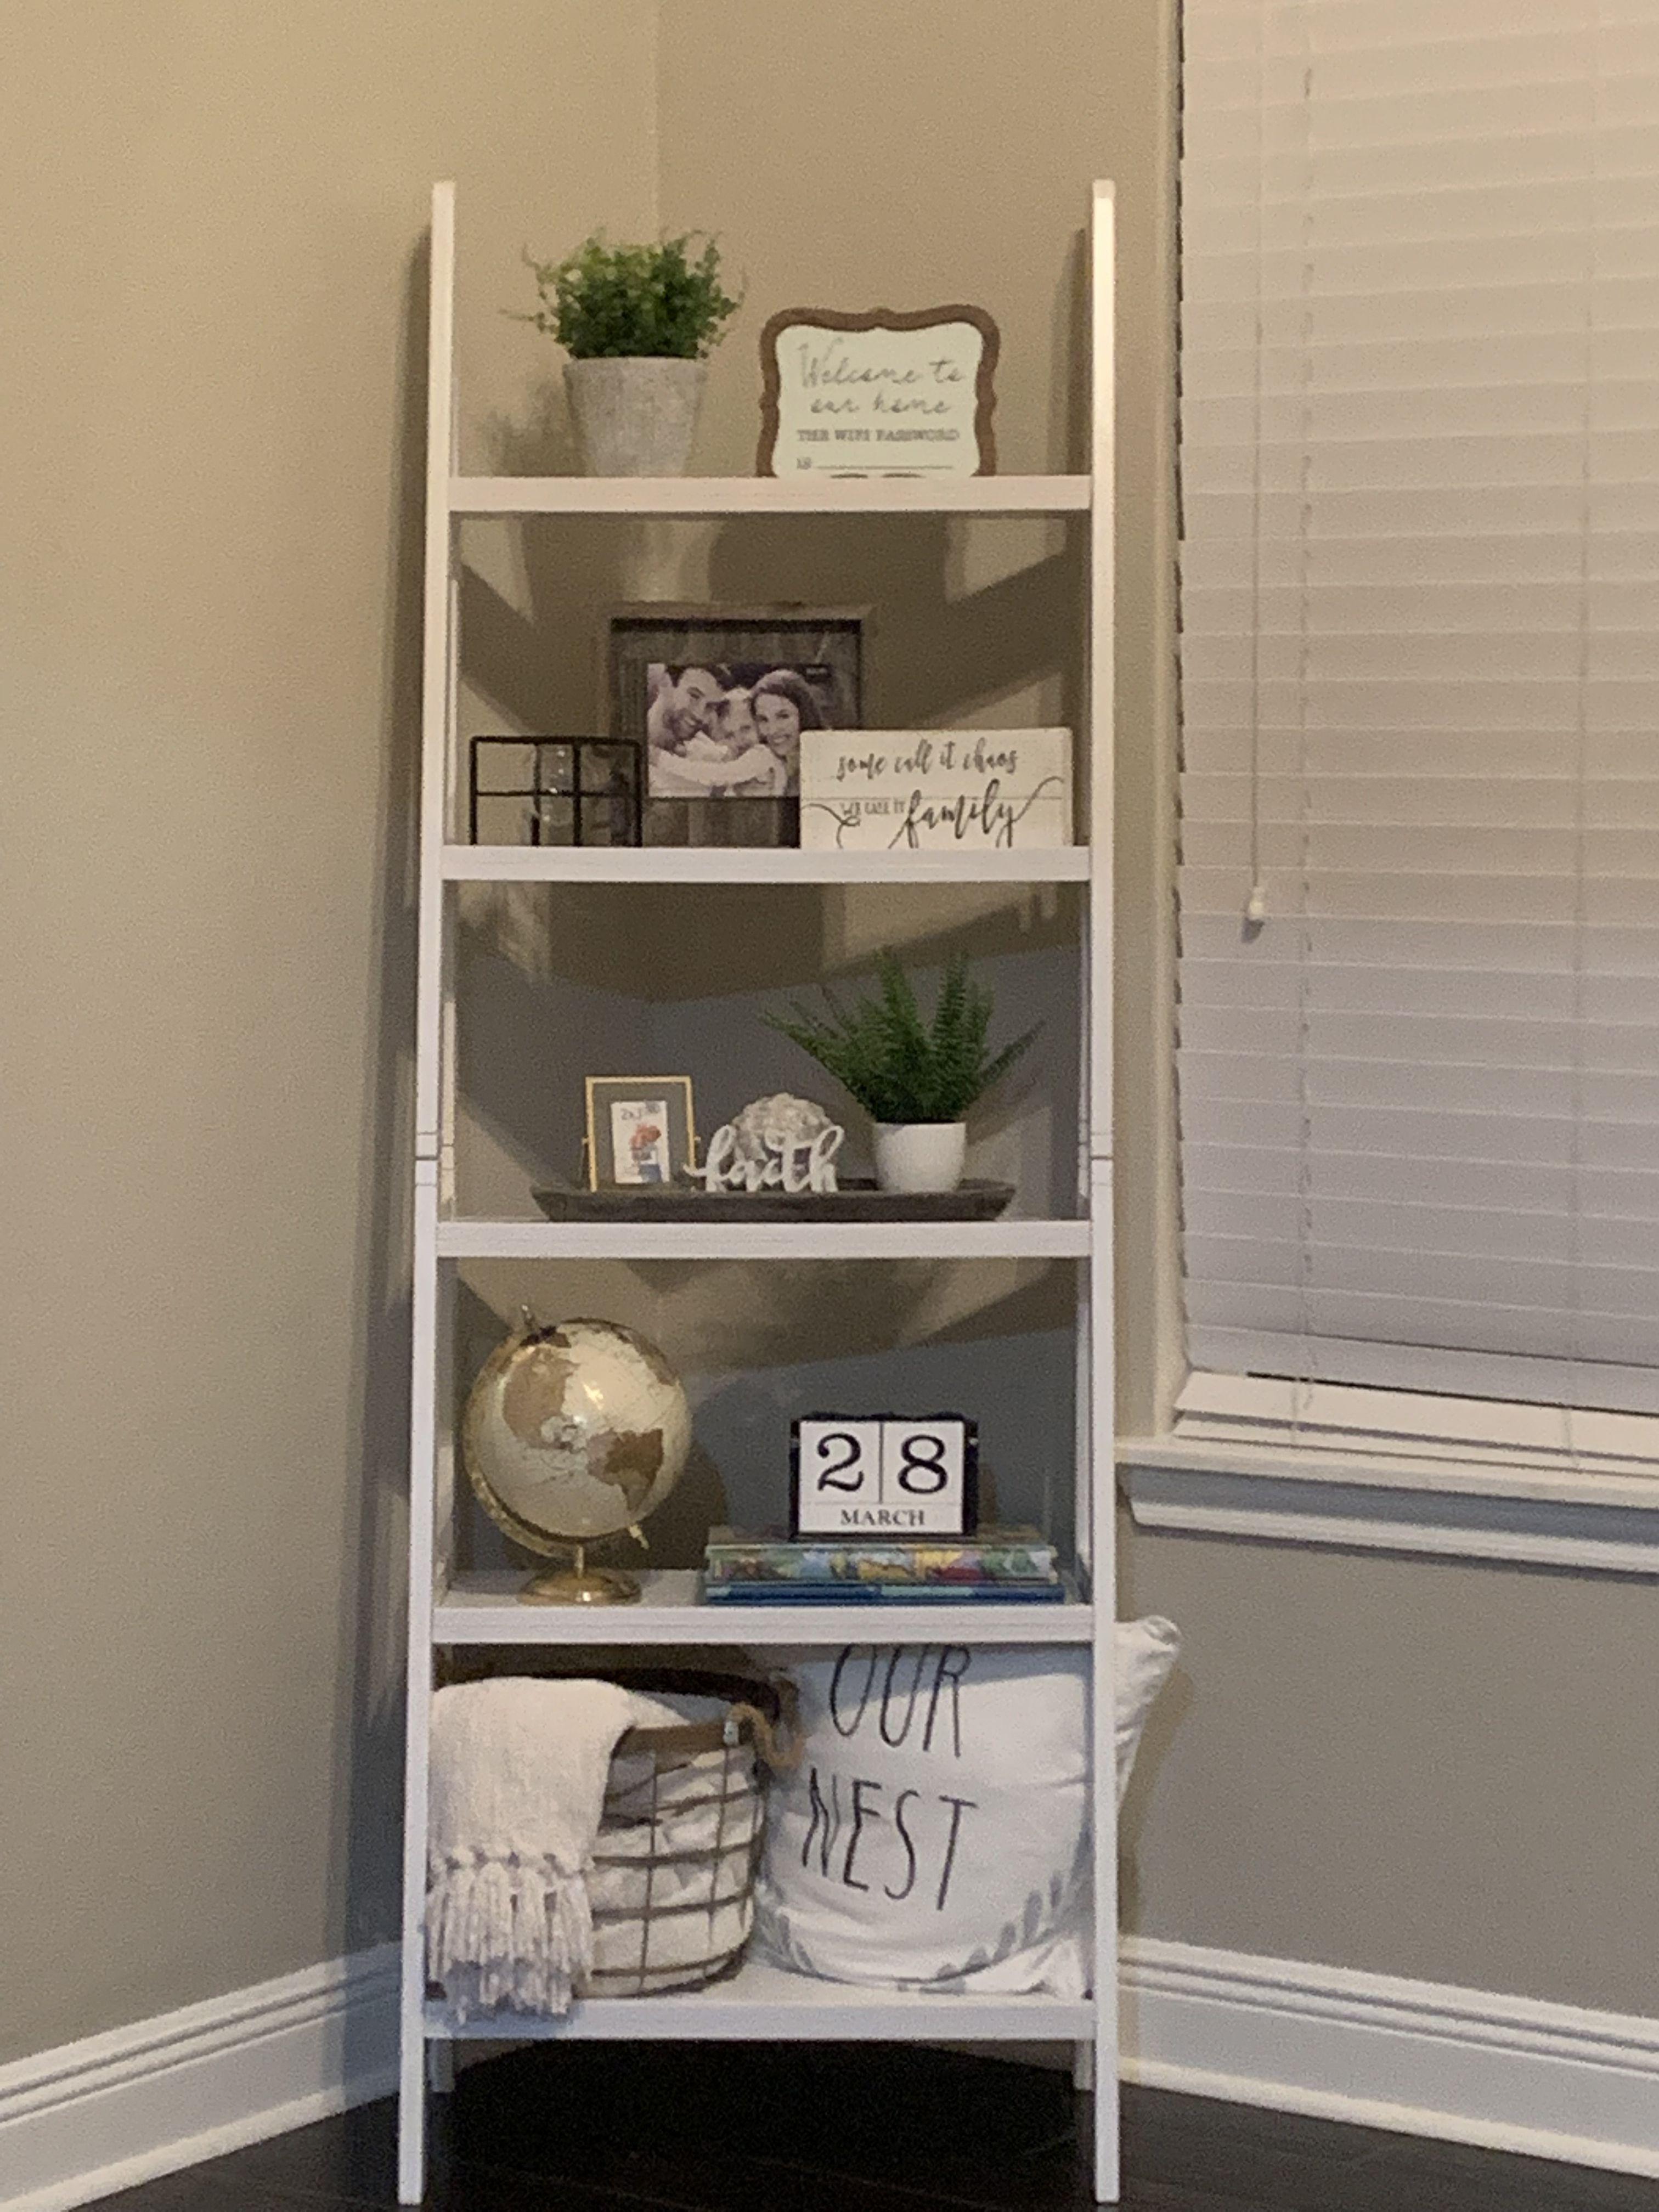 Pin By Brandy Porter On Decorating Ideas In 2020 Shelf Decor Living Room Farmhouse Shelves Decor Ladder Shelf Decor